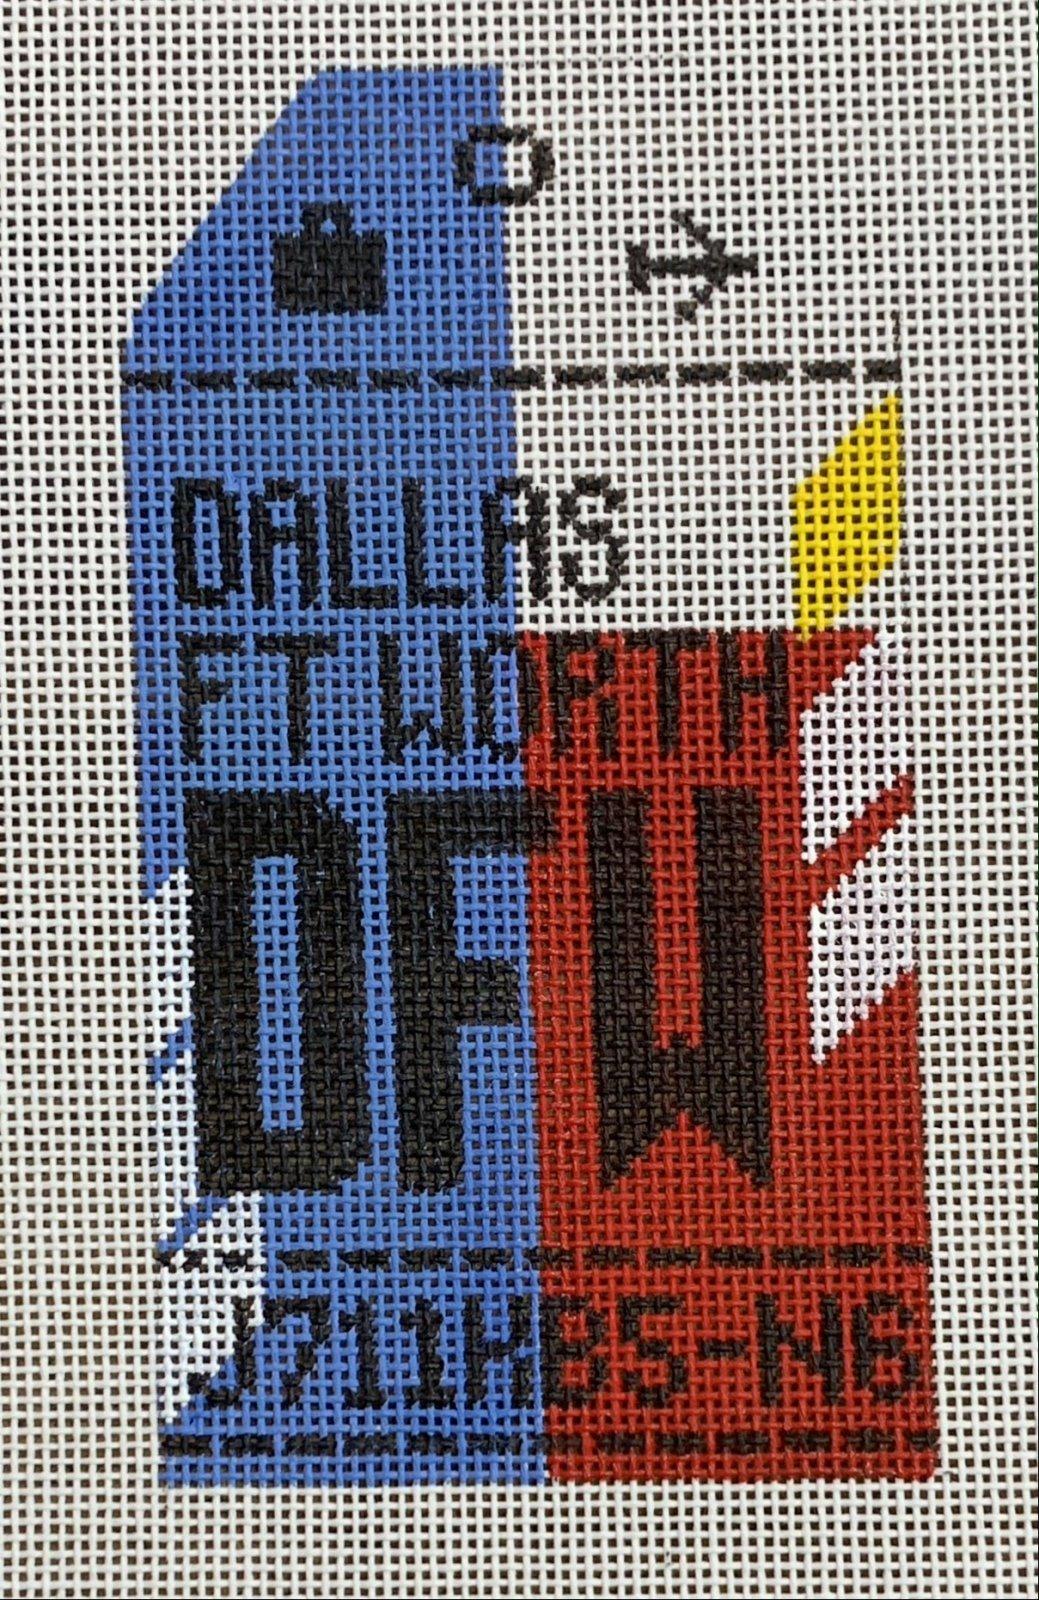 Vintage Luggage Tag - Dallas-Fort Worth